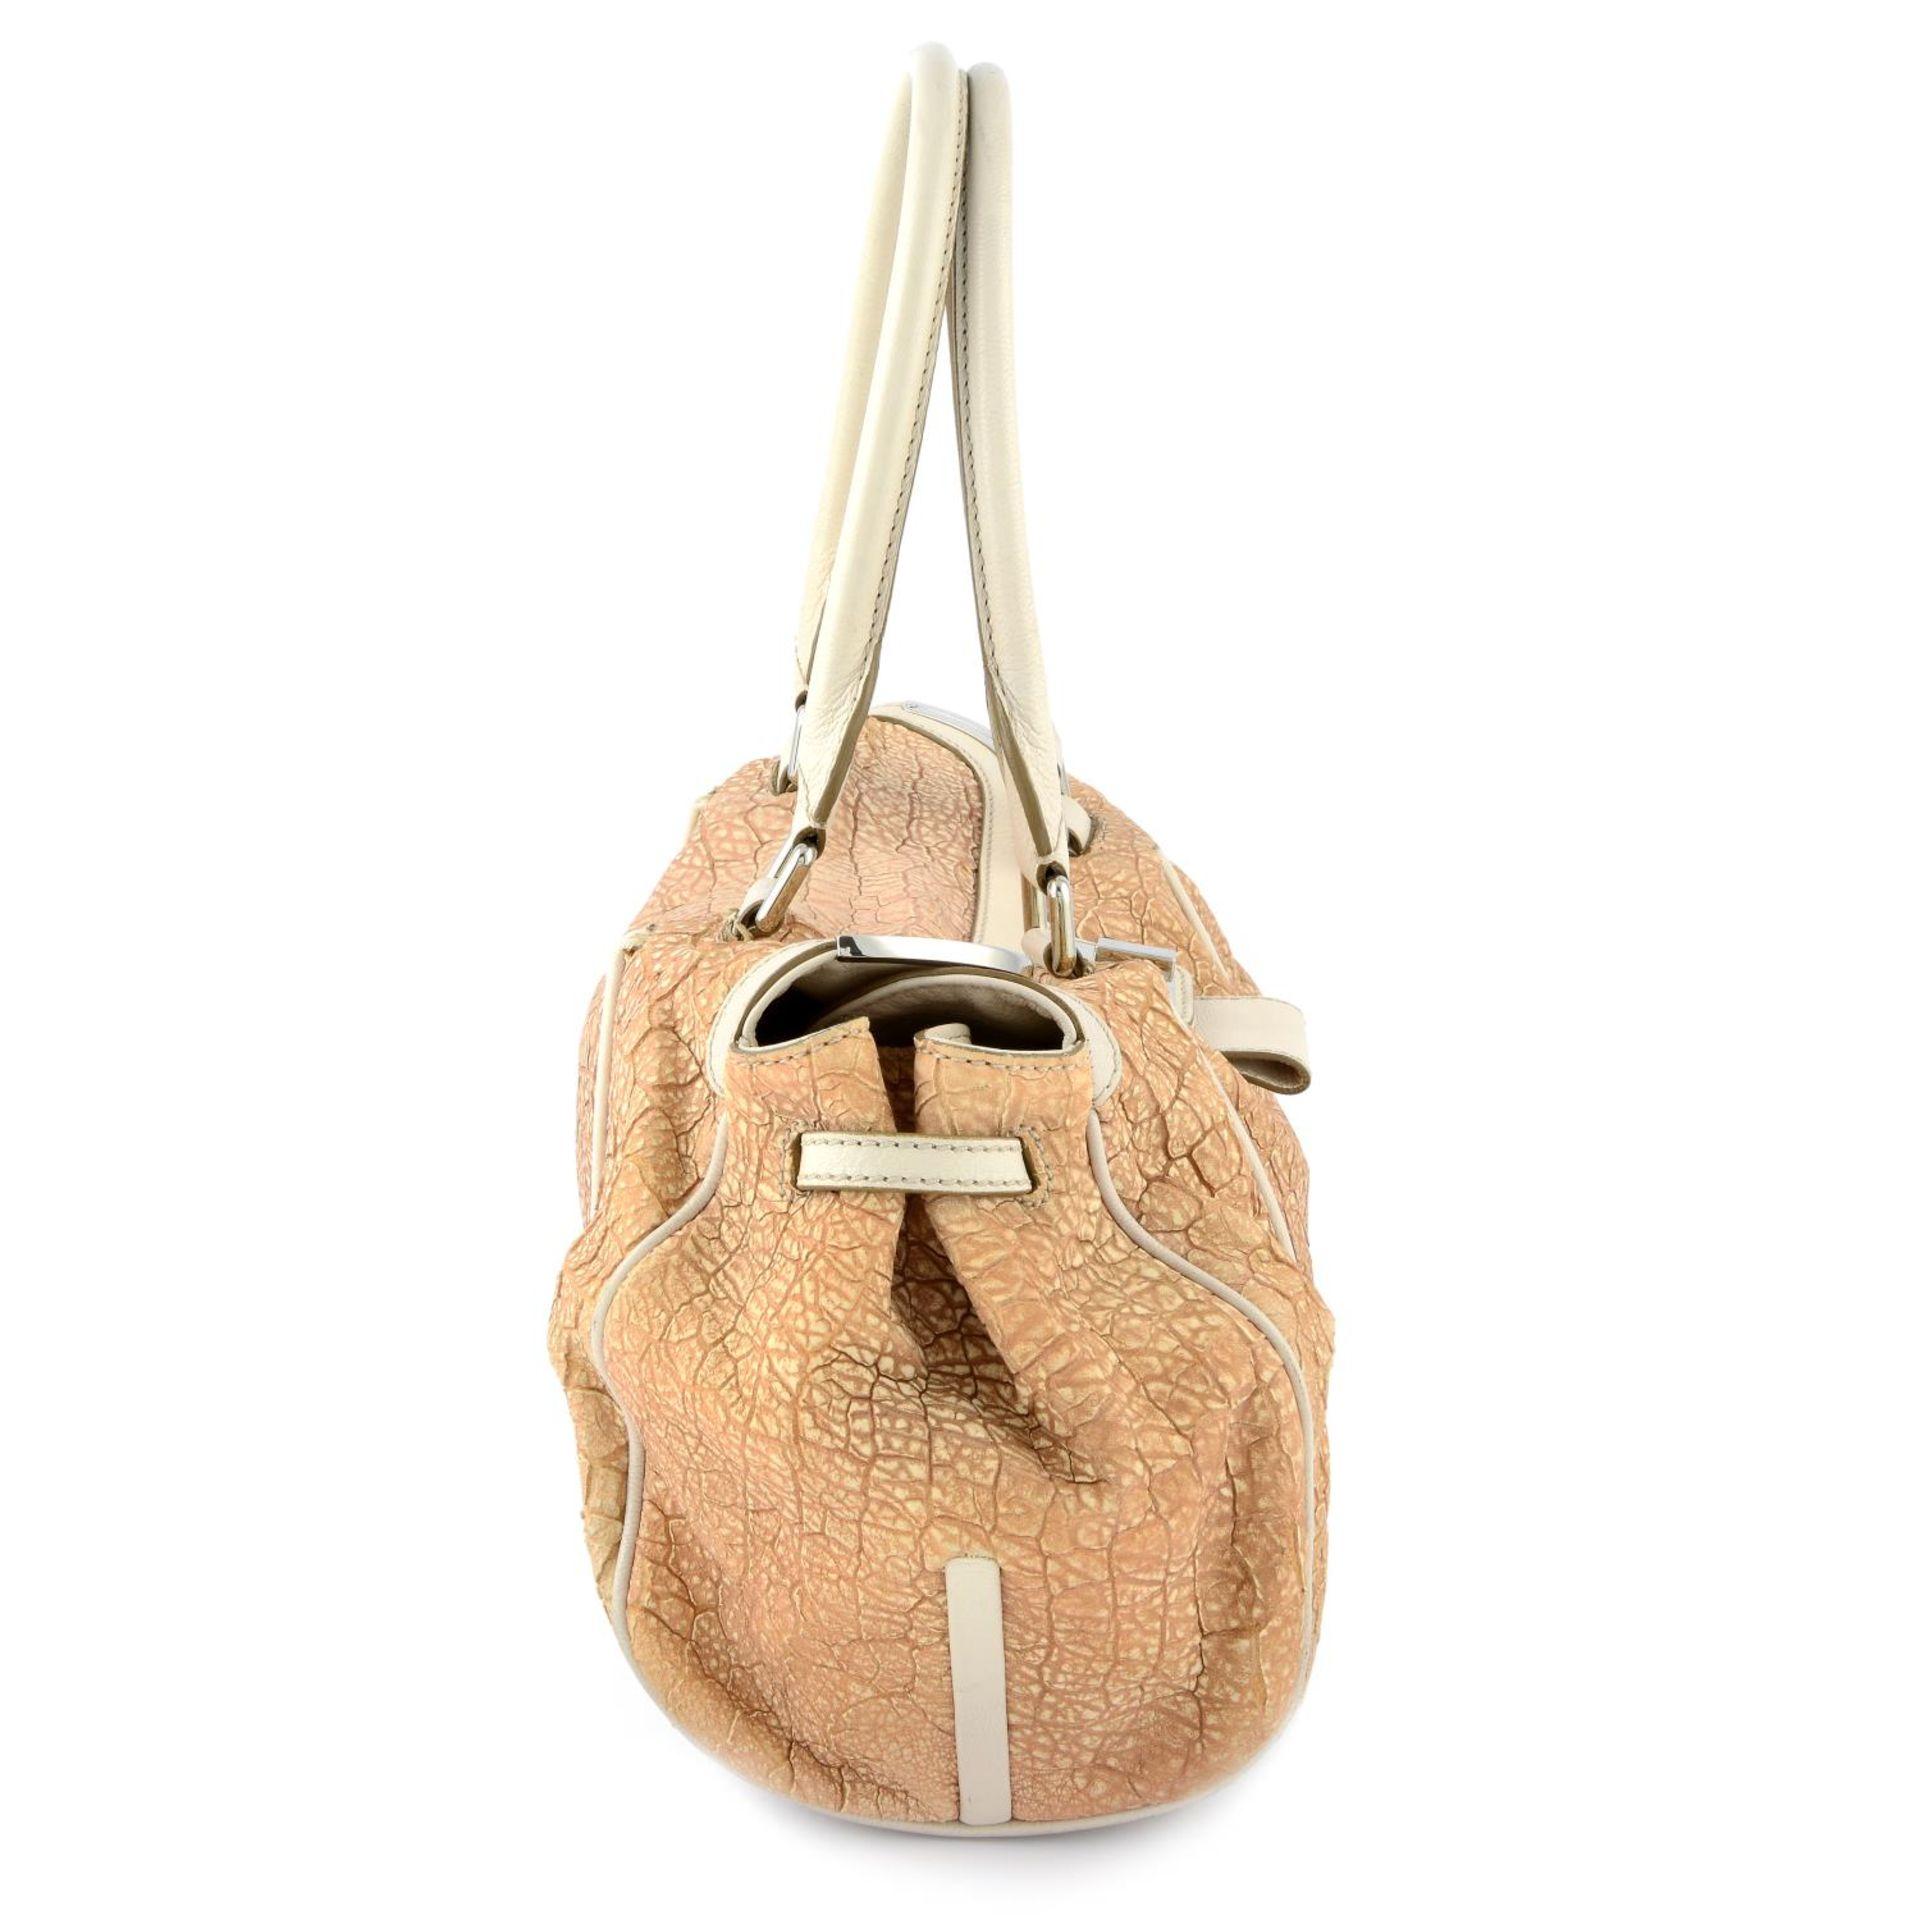 CÉLINE - a nude textured leather handbag. - Image 4 of 4